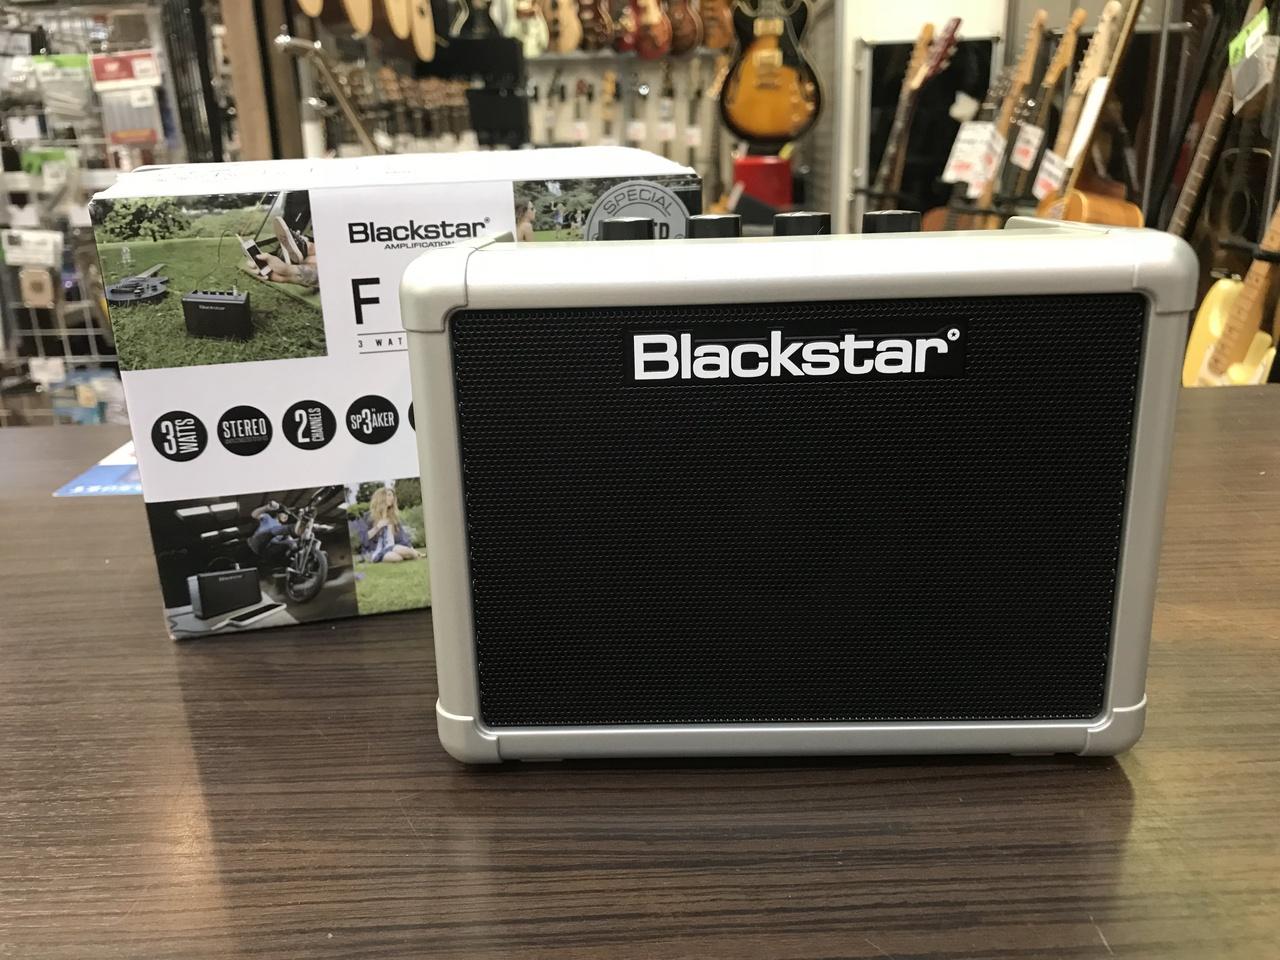 Blackstar Fly 3 Silver Limited 【即納できます!】【ミニギターアンプ】【限定モデル】